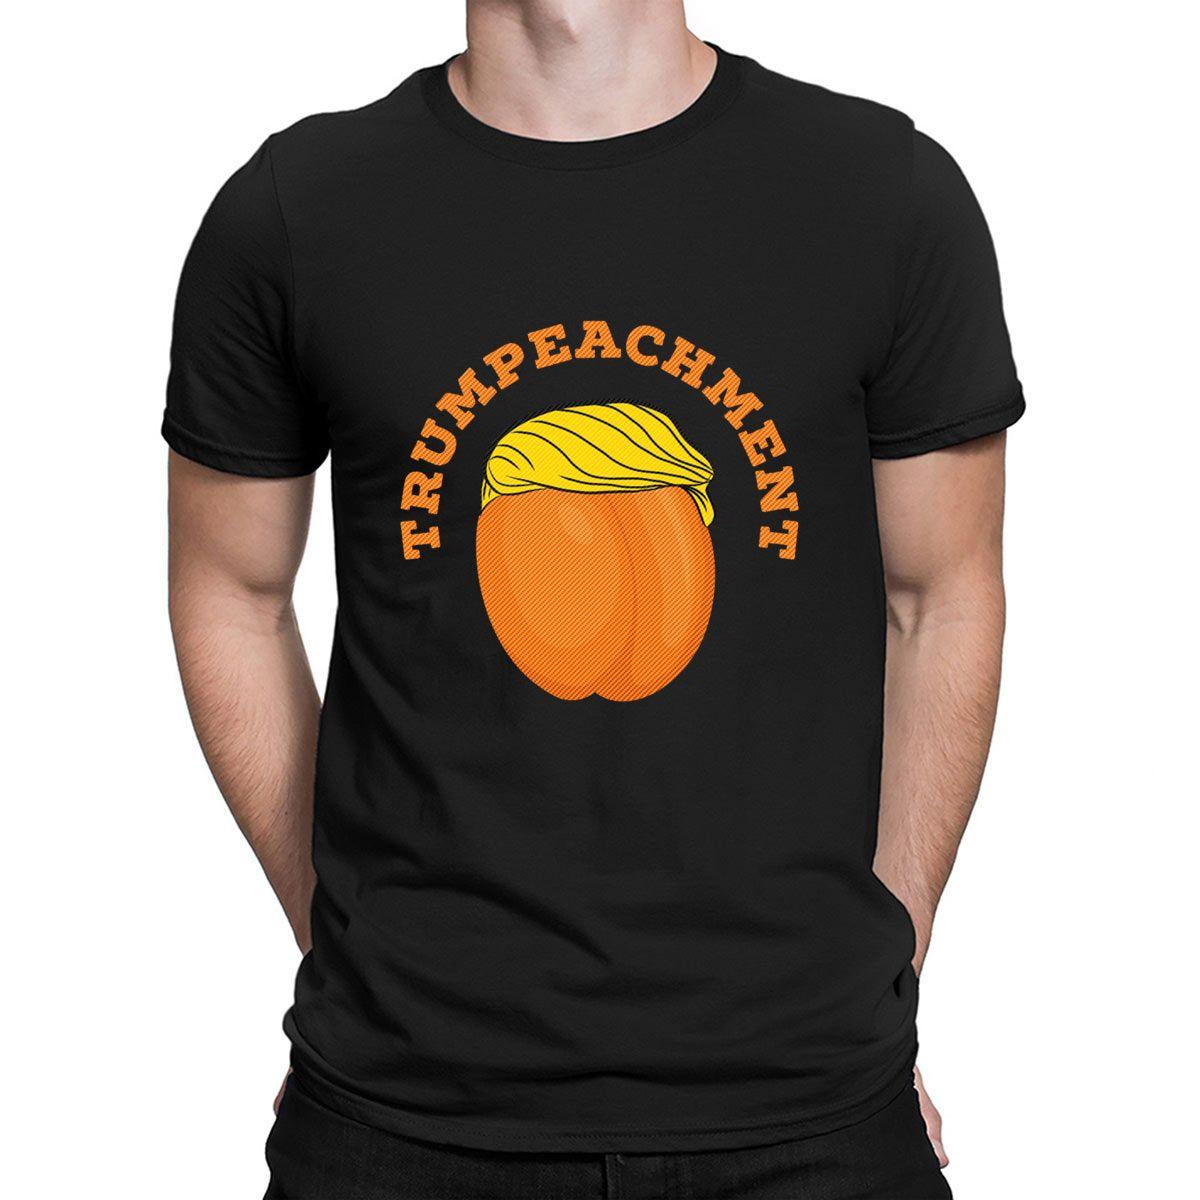 Trumpeachment Lustige Impeachment Anti Trump lustiges T-Shirt Famous Authentic-Rundhalsausschnitt Customized Cotton